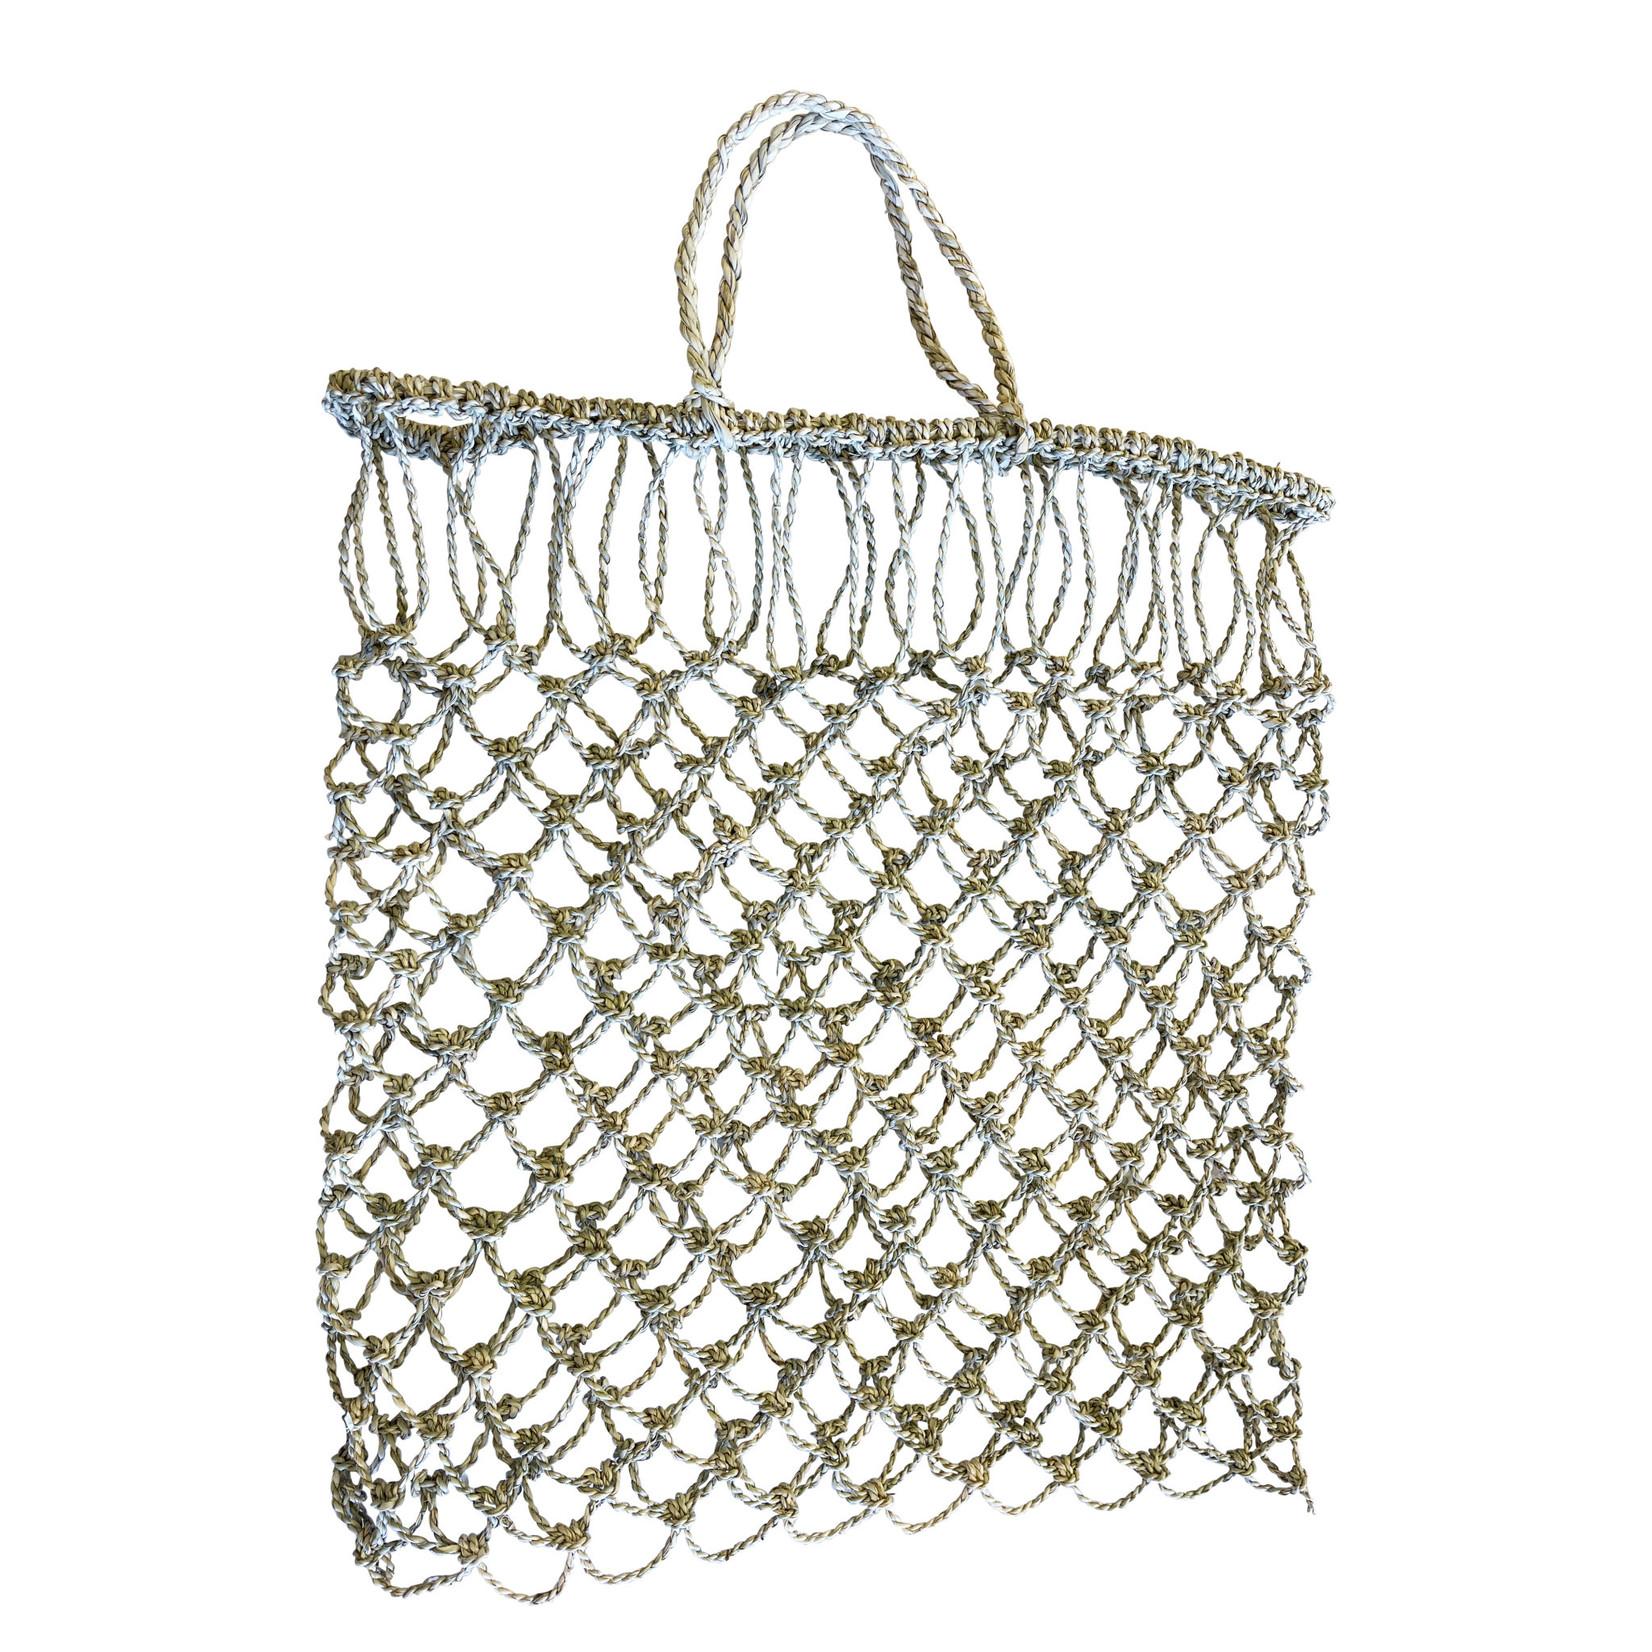 Prima de Sur. Pilwa Bag